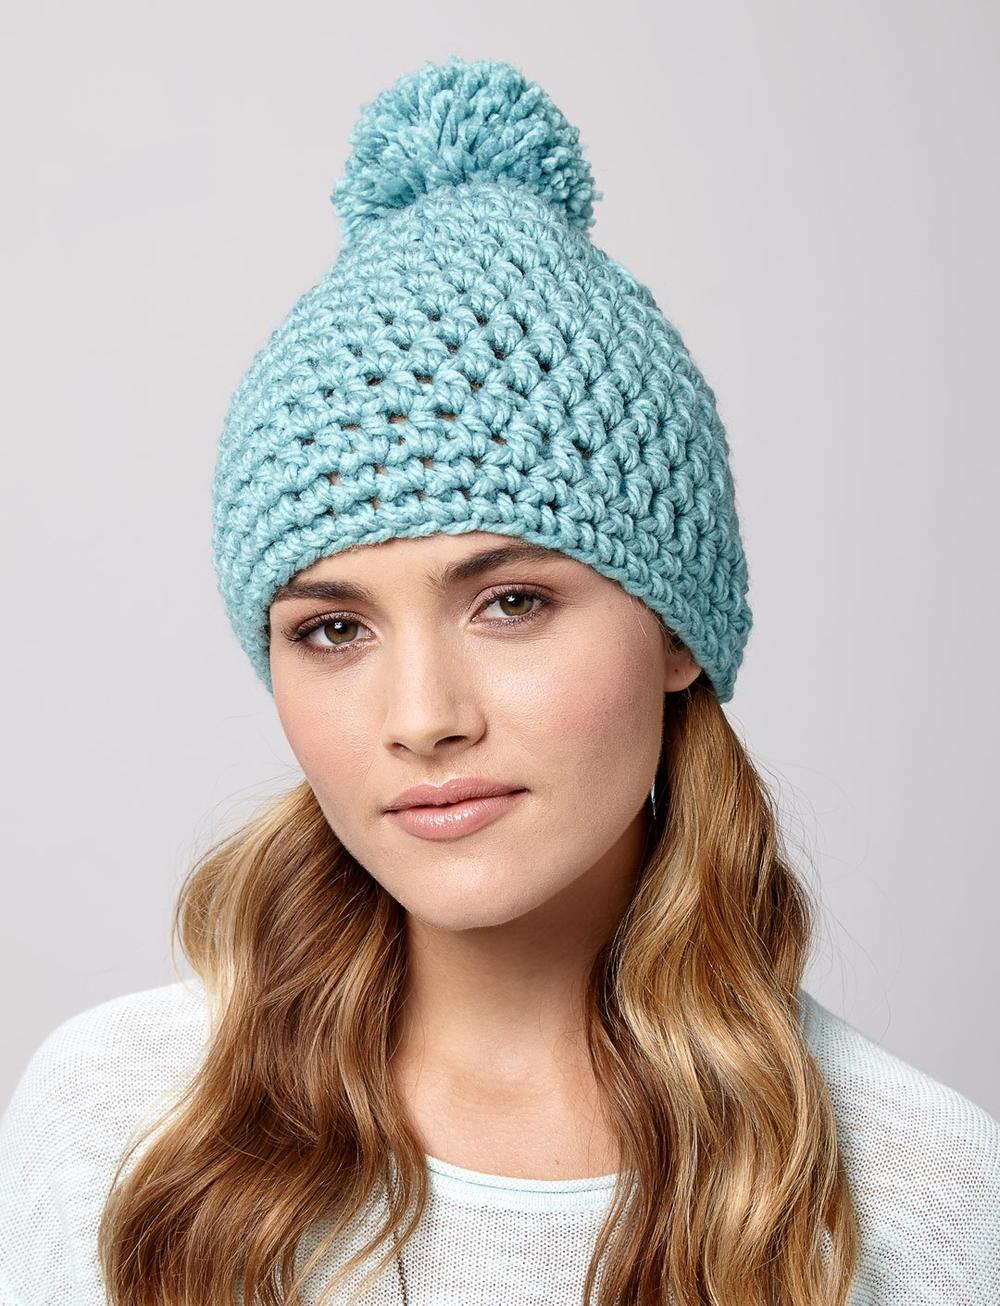 free crochet hat patterns snow drift crochet hat hmrdzso